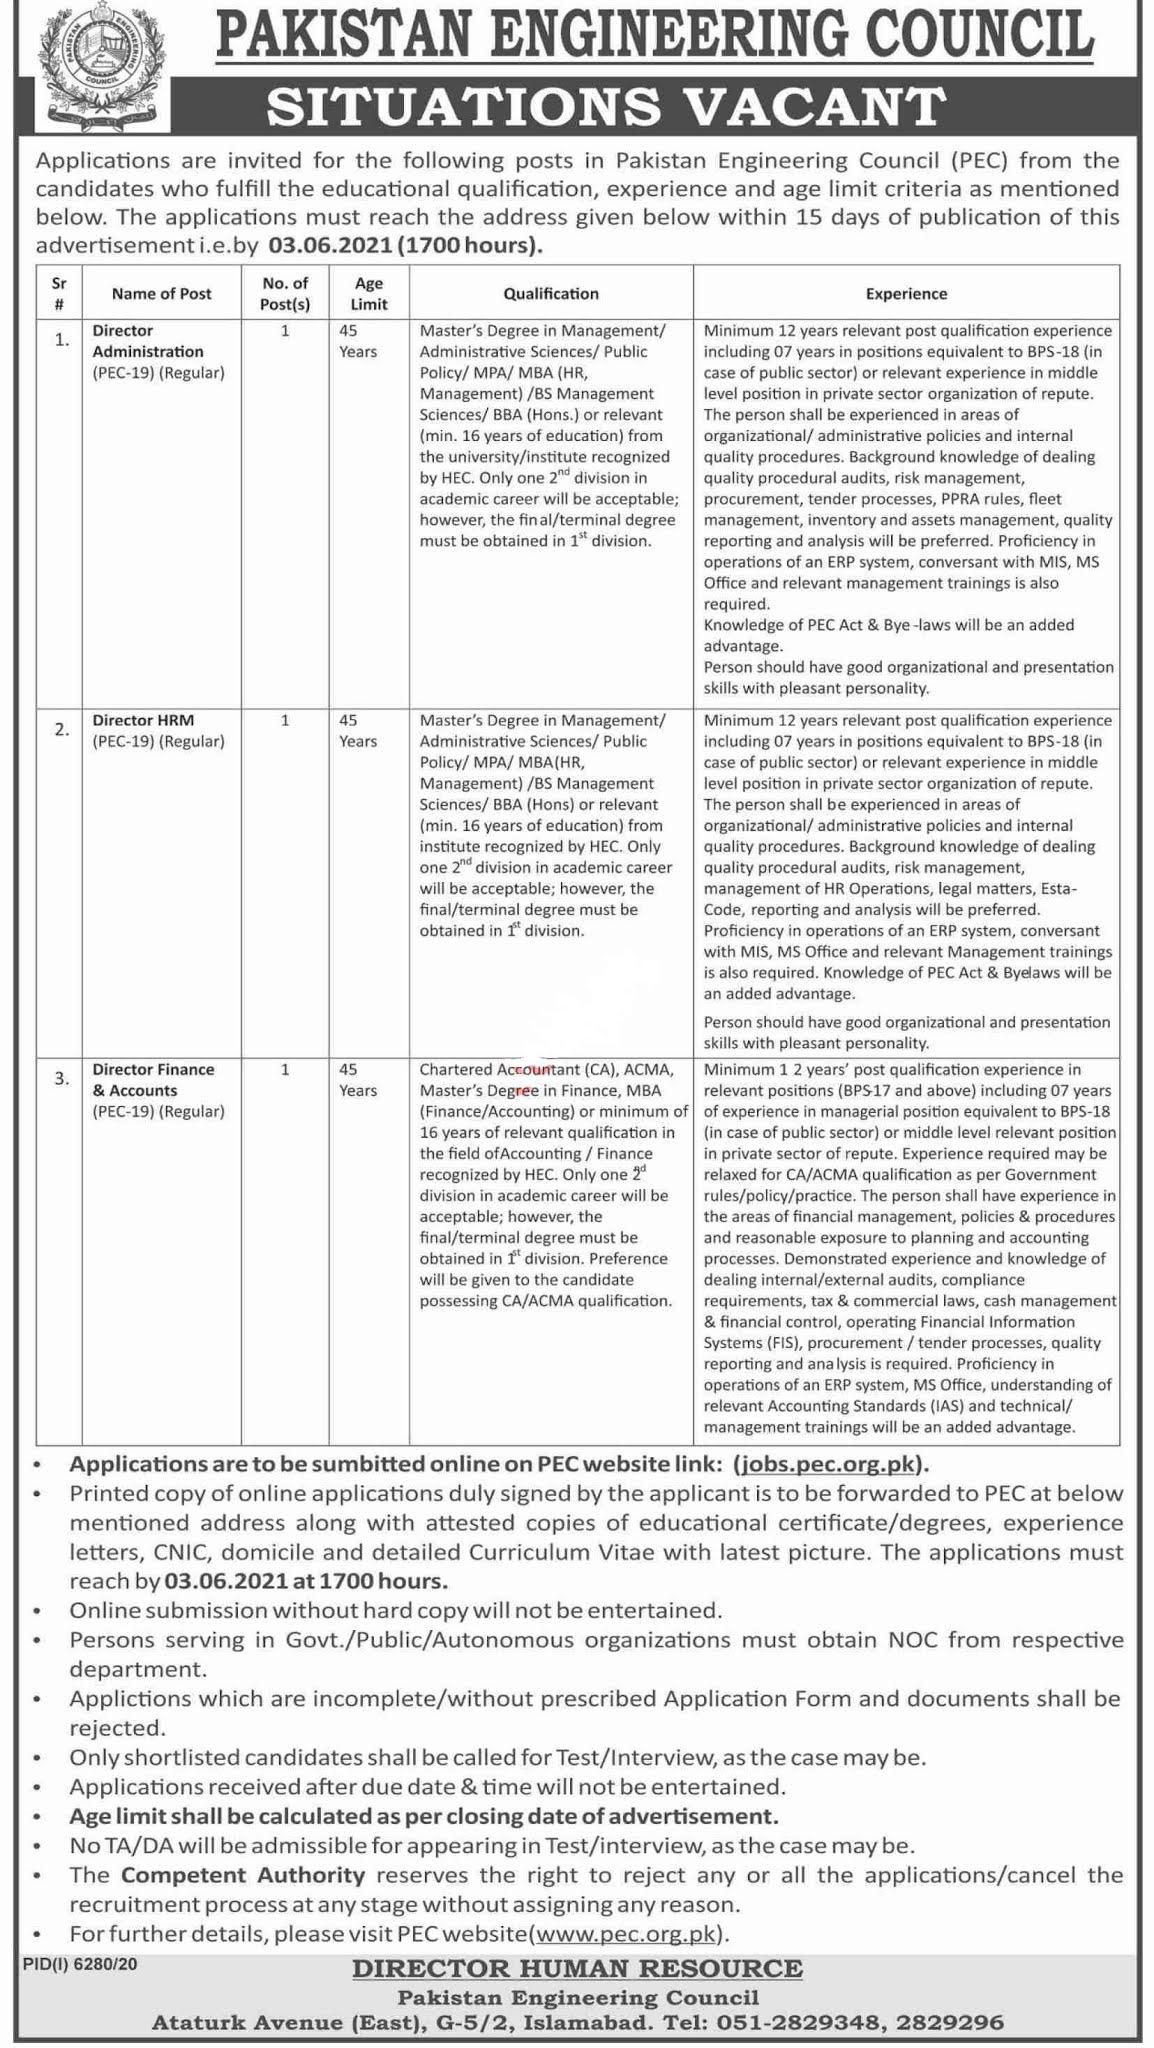 Pakistan Engineering Council PEC Islamabad Jobs 2021 for Director, Director Administration, Director HRM, Director Finance, Director Accounts